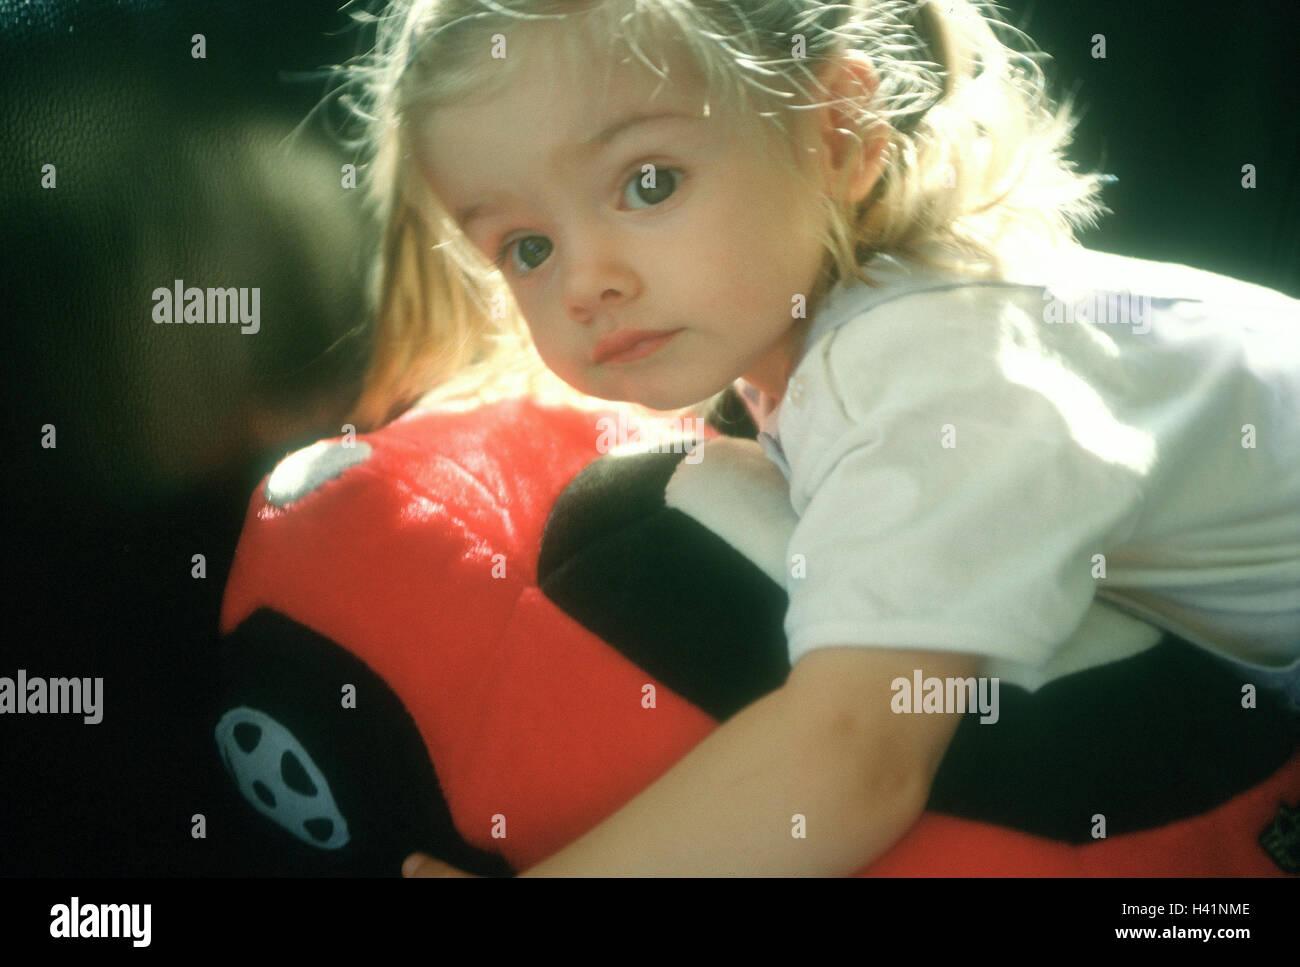 Toddler, girls, Kuschelkissen, lies   indoors, at home, child, childhood, pillows, child pillows, toy, Kissenauto, Stock Photo